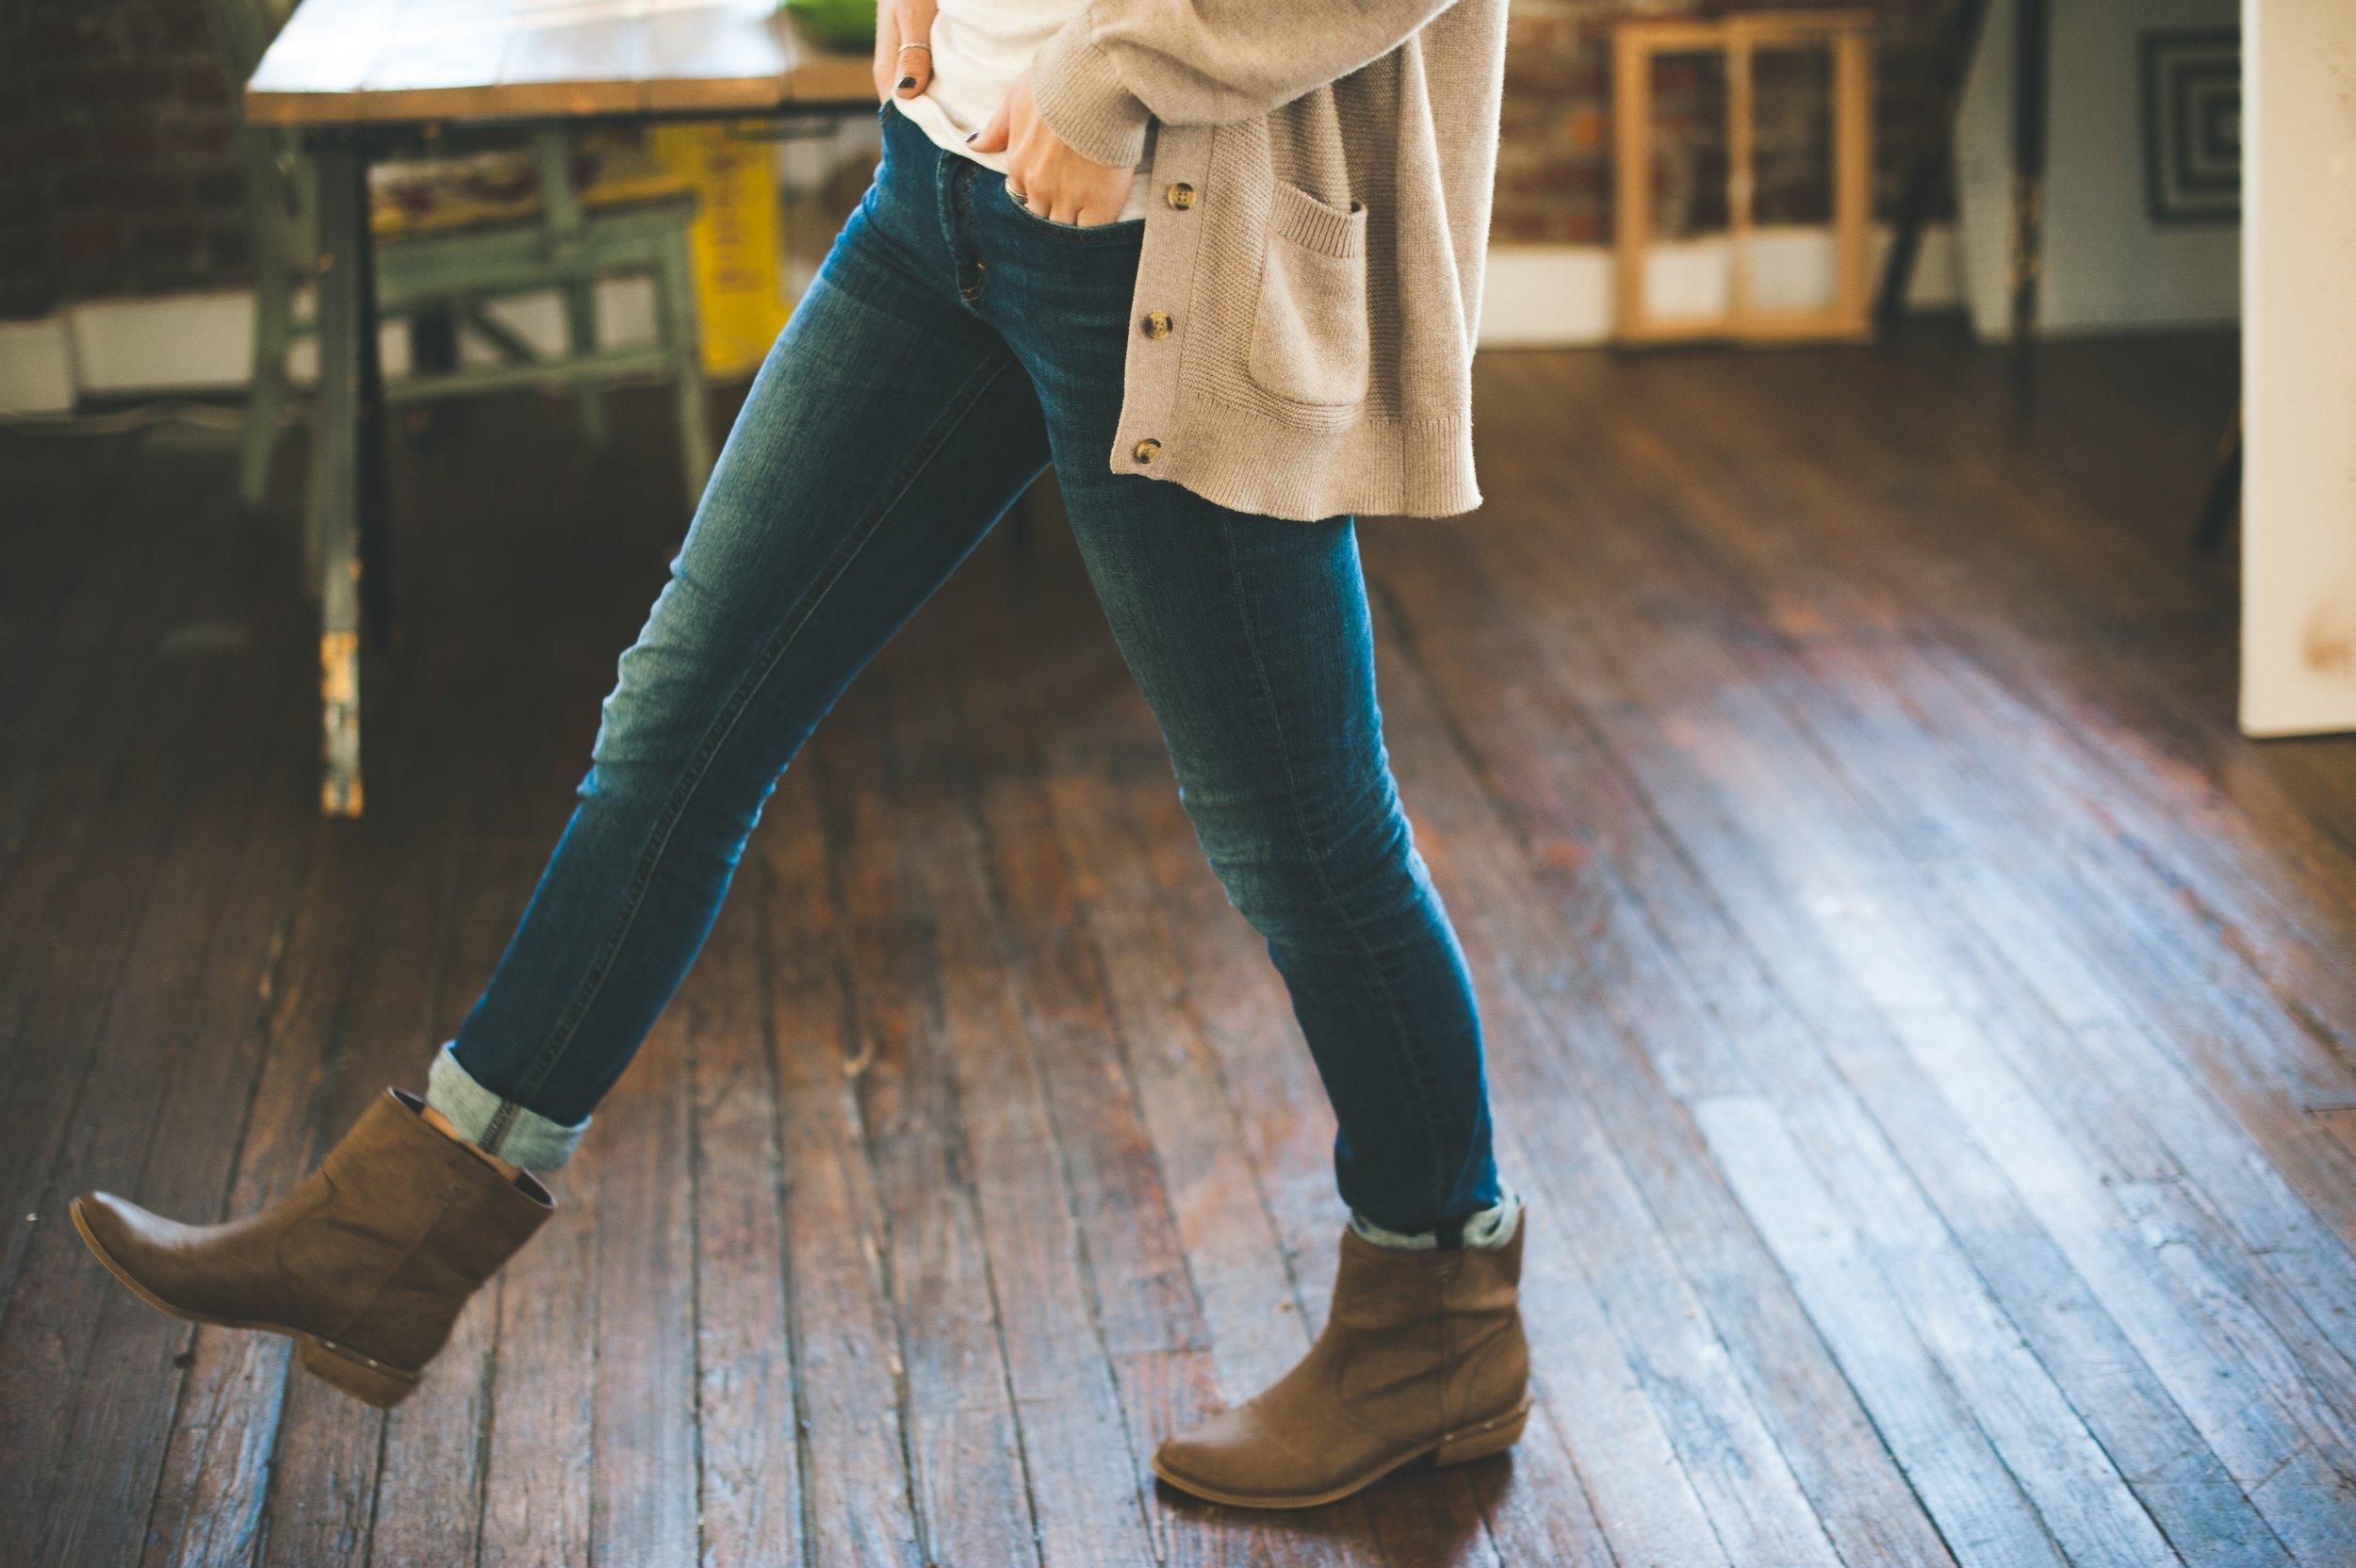 boots-cardigan-denim-6710.jpg